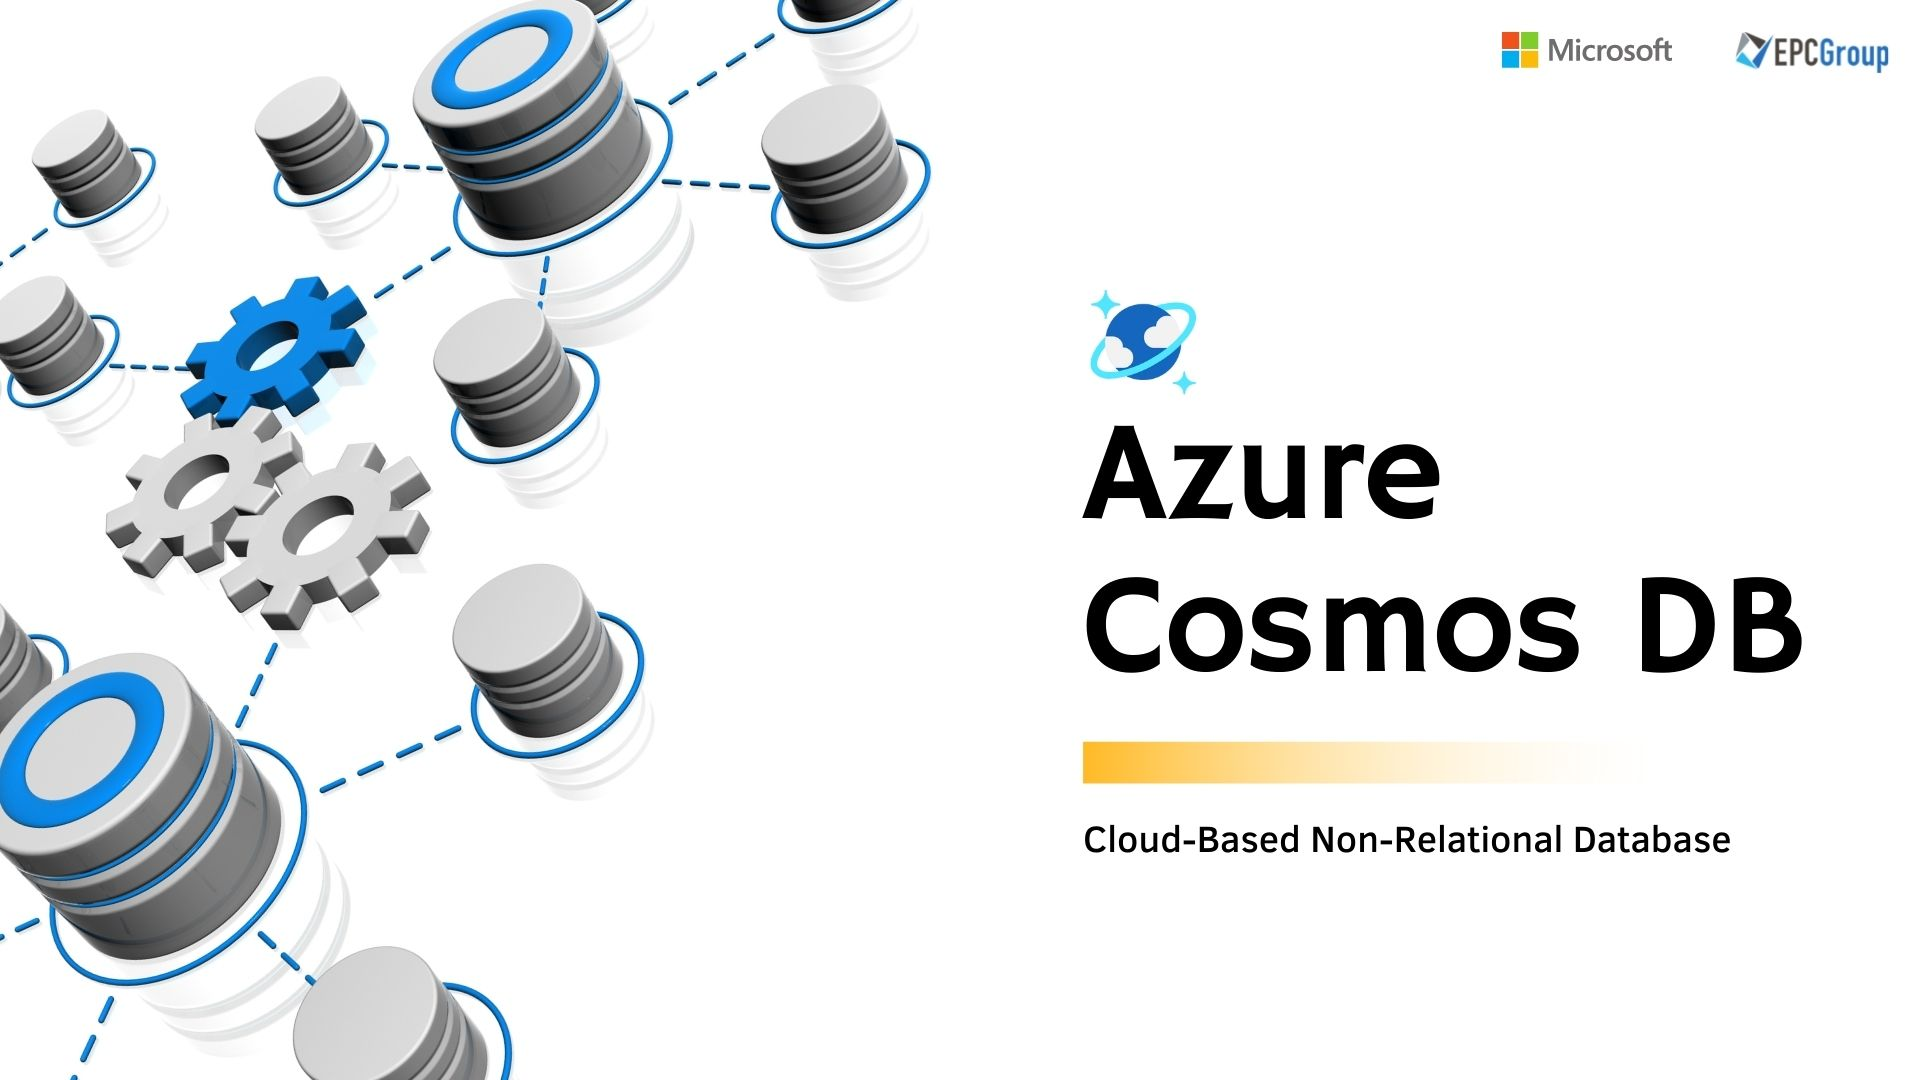 Azure Cosmos DB: Cloud-Based Non-Relational (NoSQL) Database - thumb image